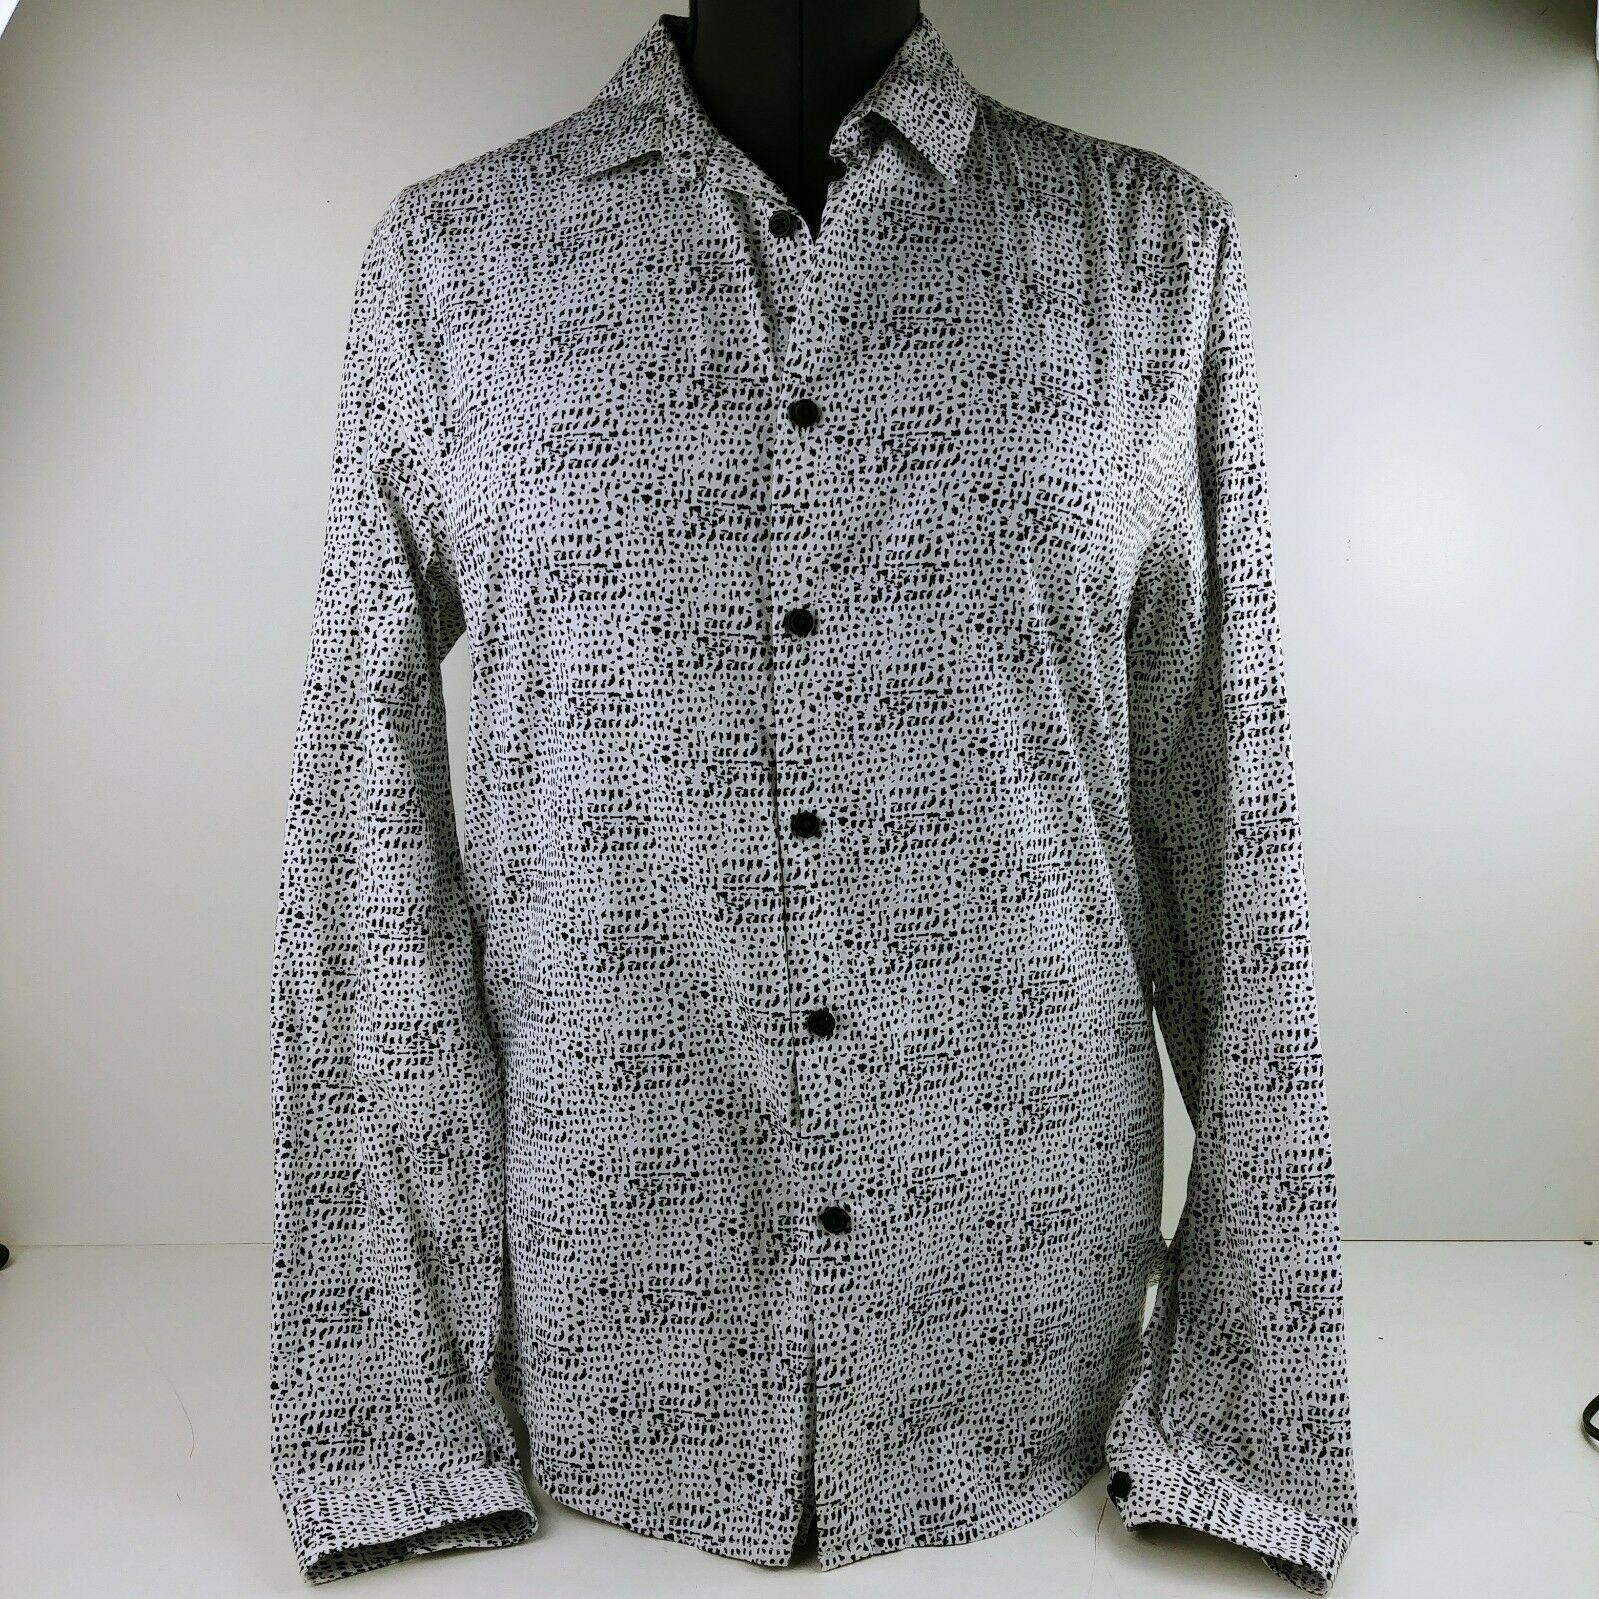 3fd7d073e15865 Asos Women's Black & White Button-up Shirt Blouse Size M Long Sleeve Work  Career